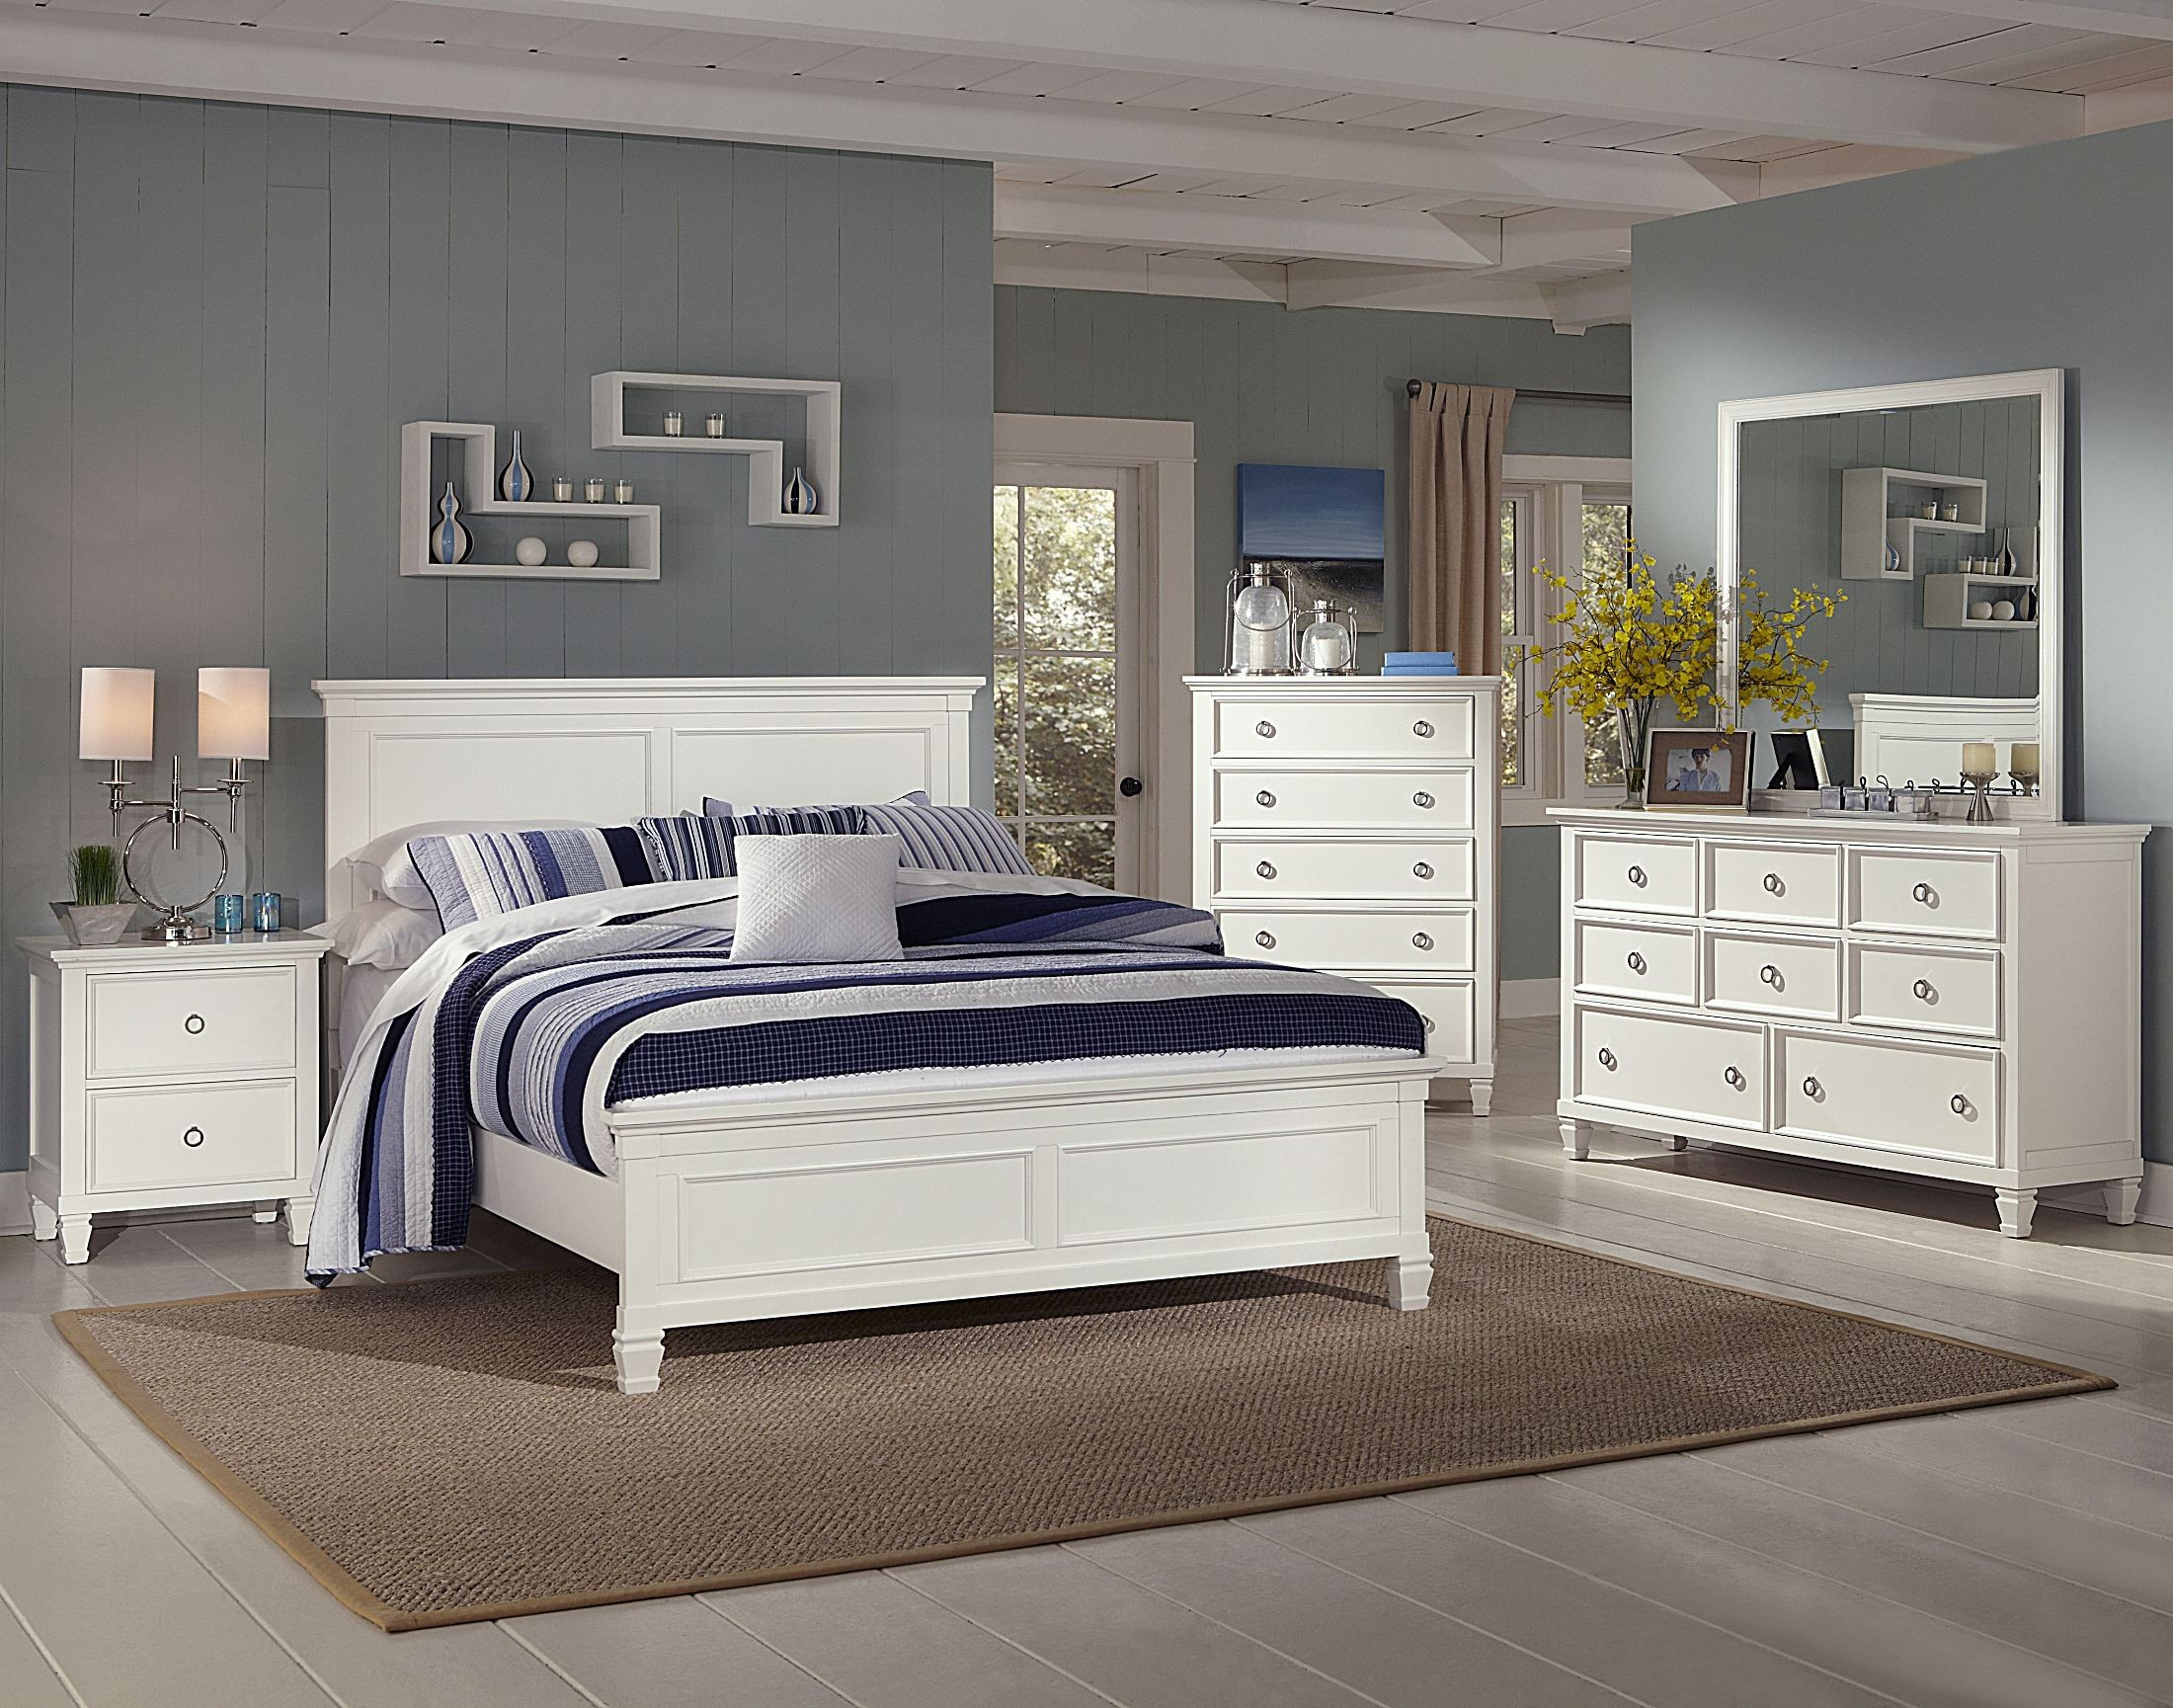 Delicieux Tamarack White Platform Bedroom Set From New Classics (00 044 315 335) |  Coleman Furniture